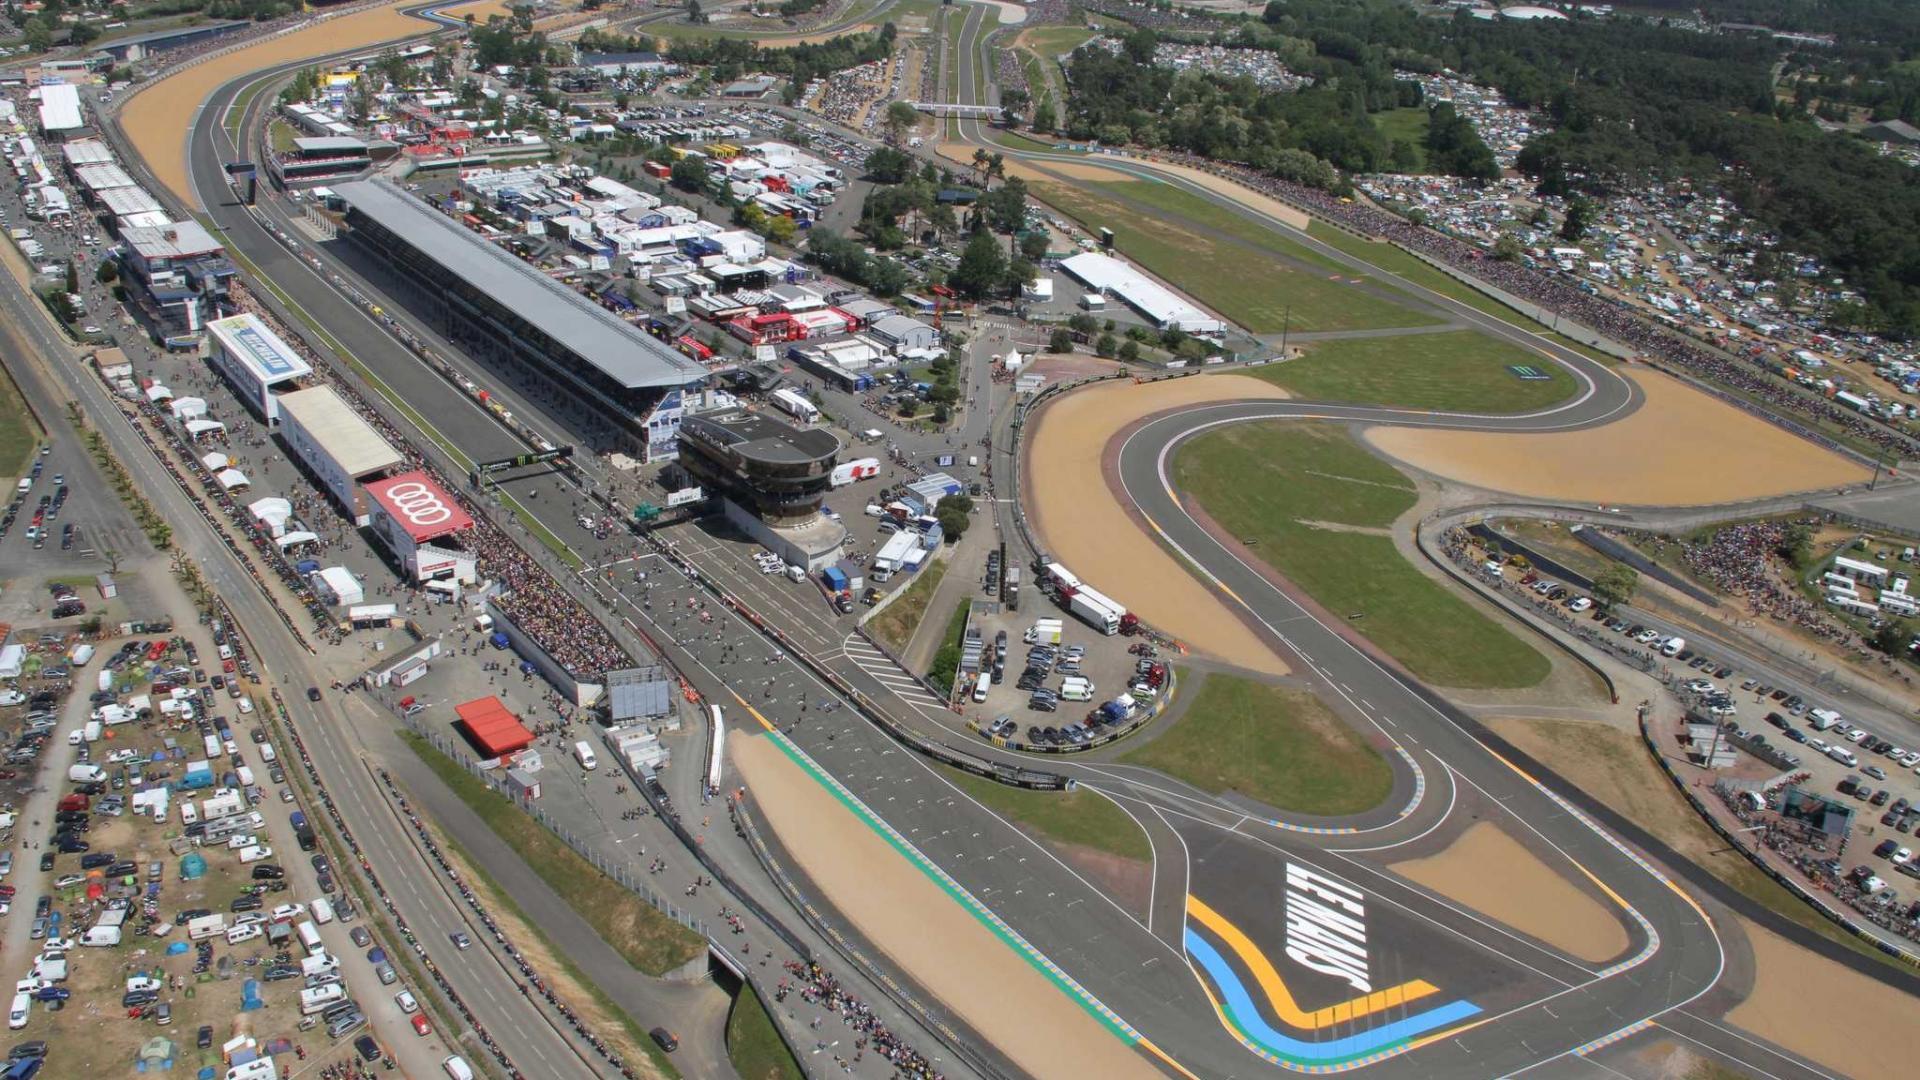 MotoGP orari GP Francia 2019 - Le Mans